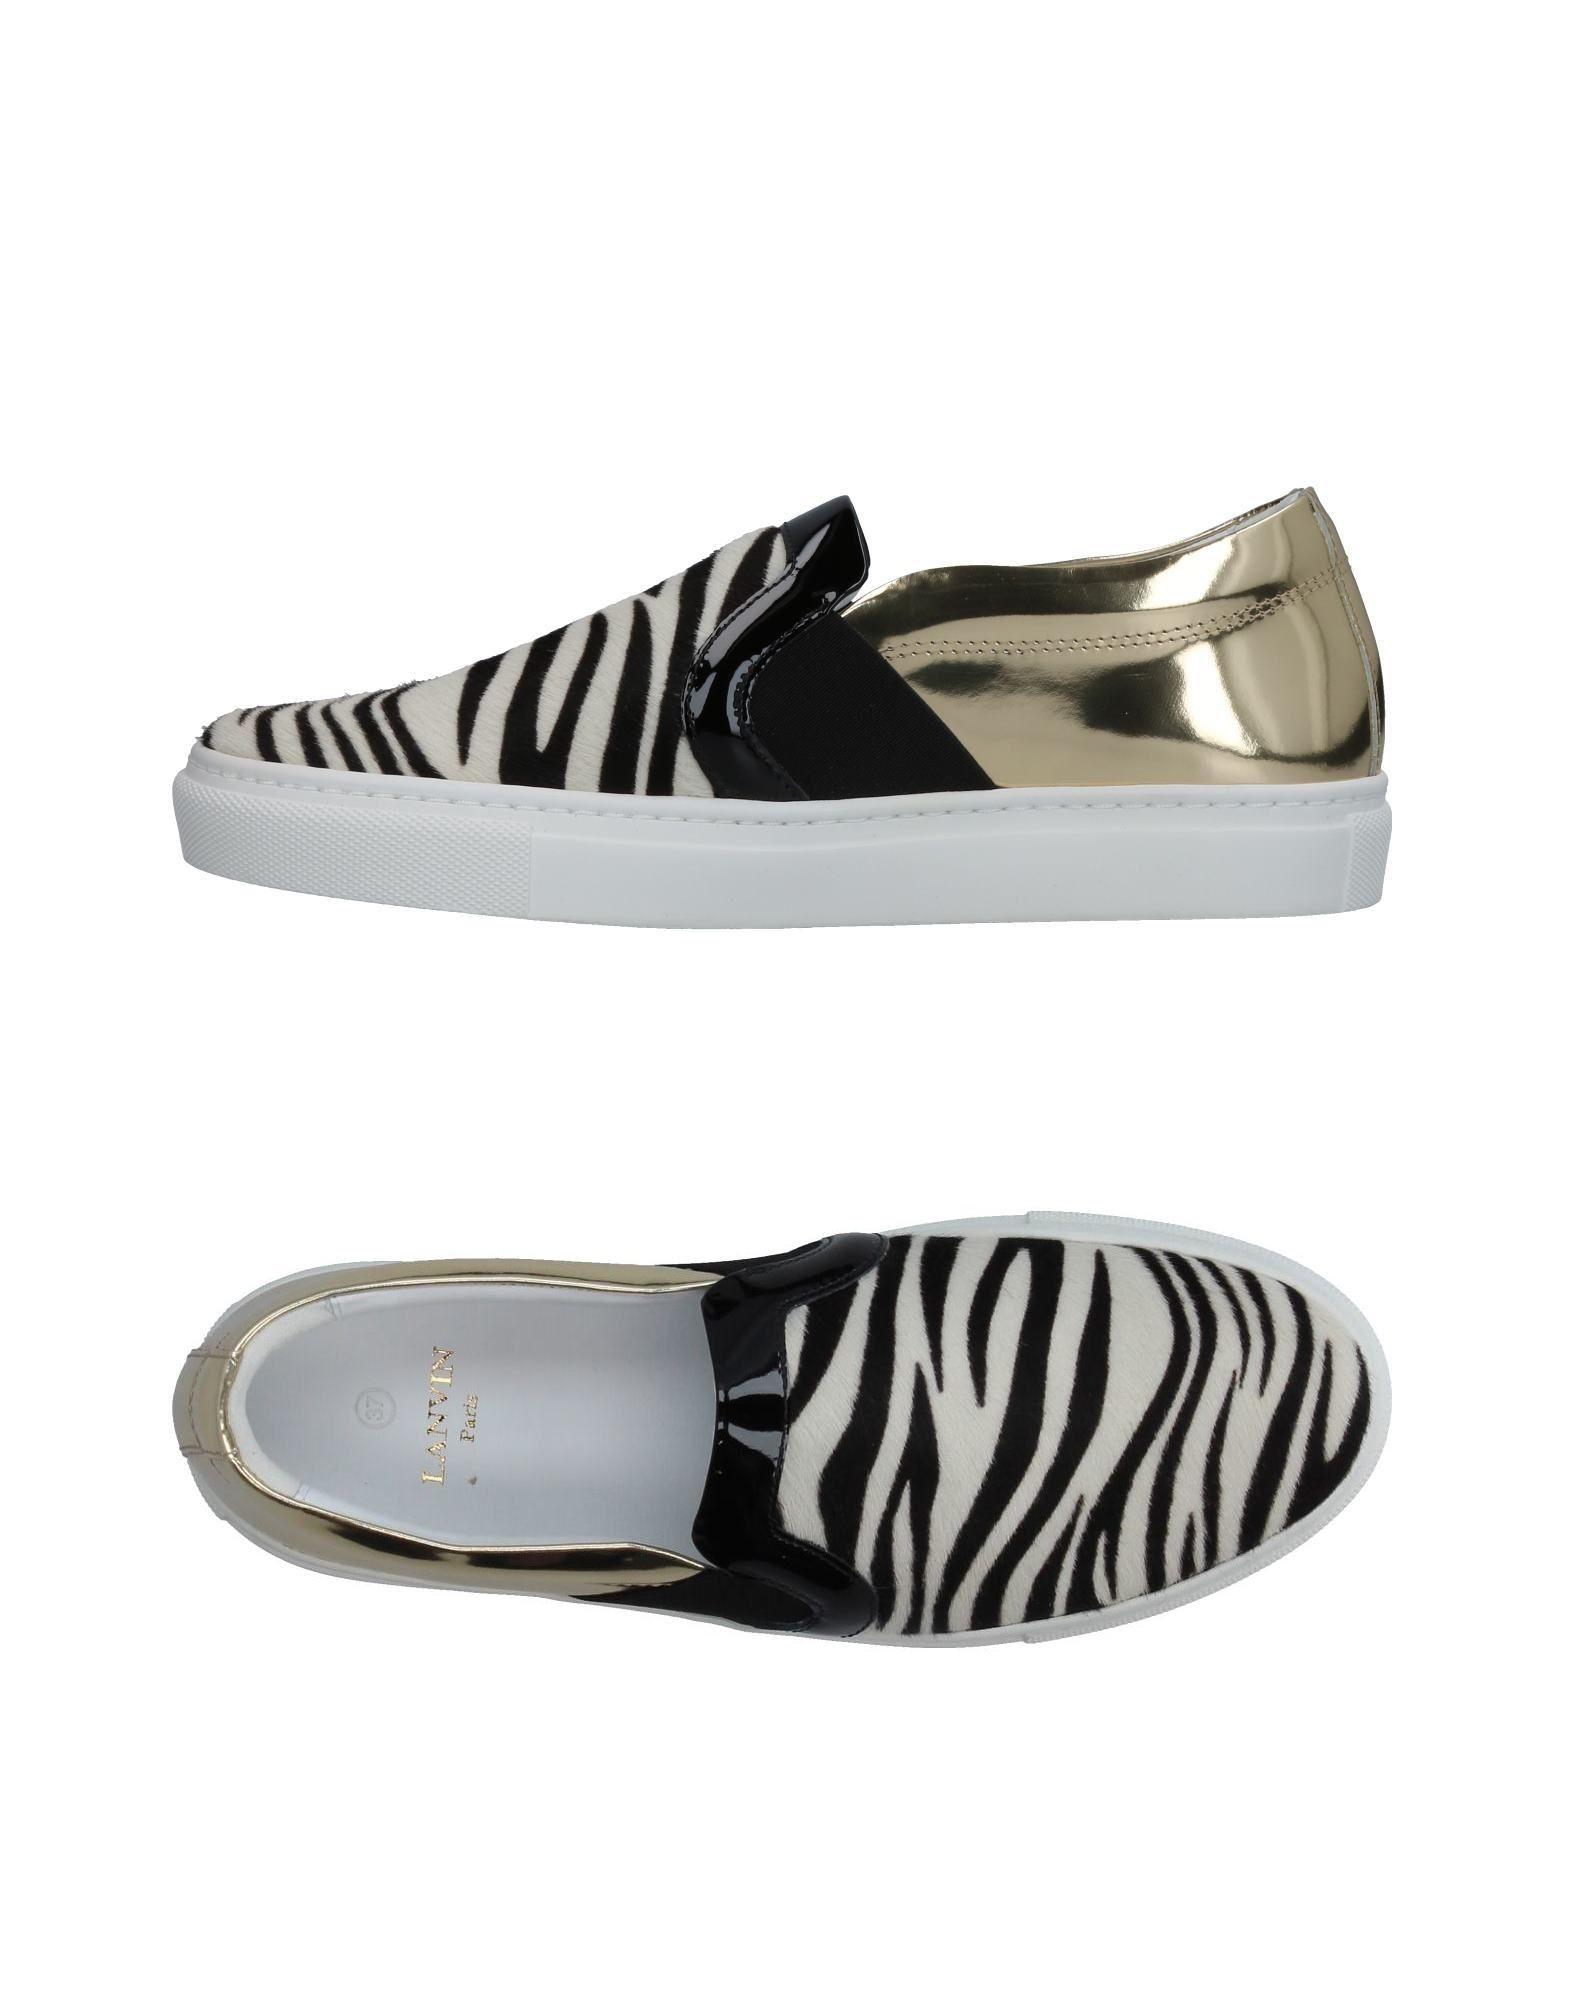 Lanvin Sneakers Damen  11413418XPGut aussehende strapazierfähige Schuhe